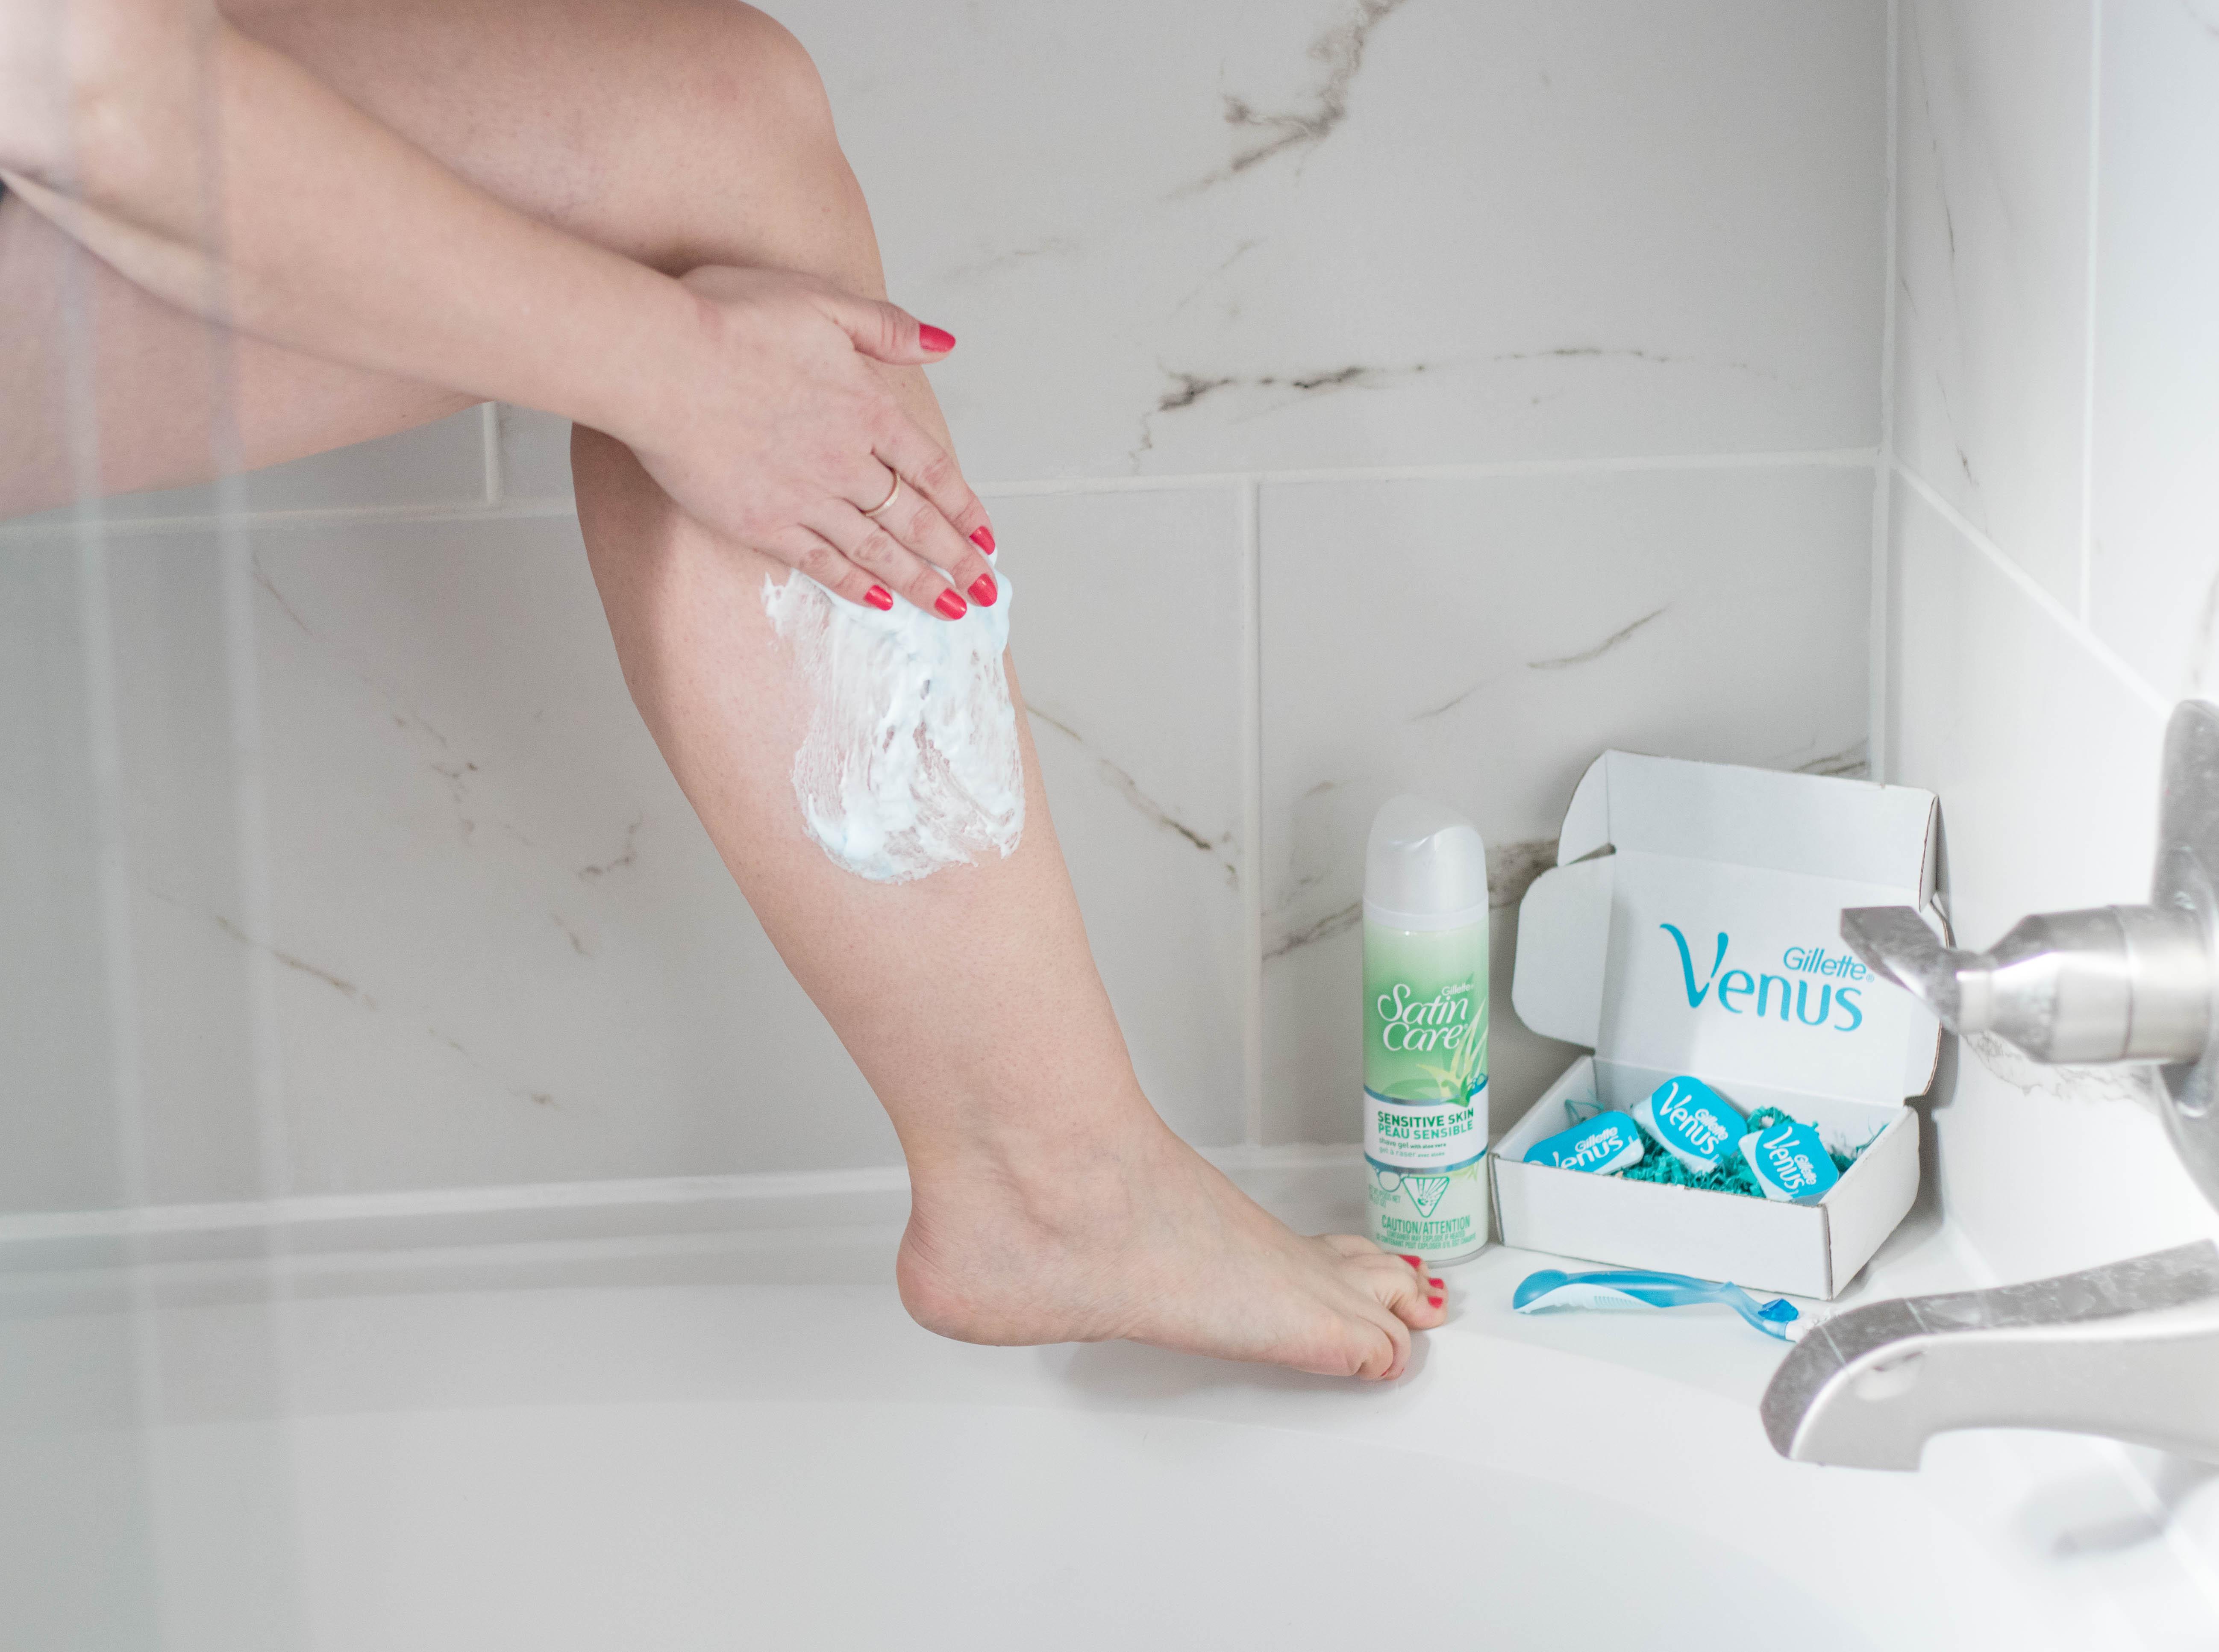 women's shave club venus direct #shaveclub #venus #skincare